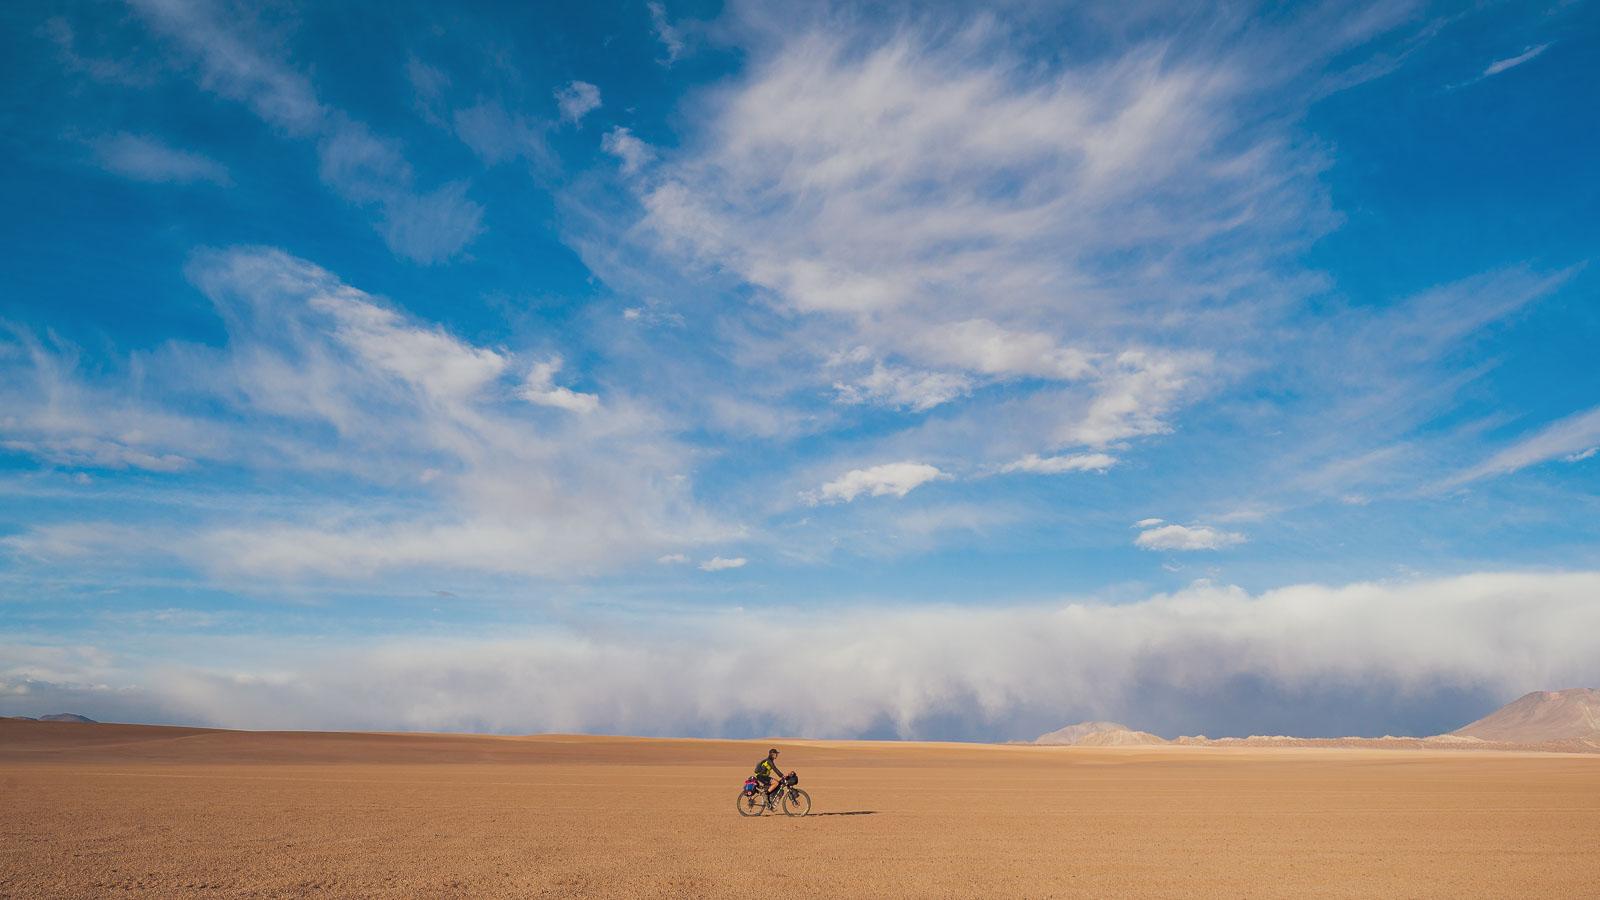 Bolivia/Chile: Uyuni – San Pedro de Atacama via Lagunas Route & Volcan Uturuncu